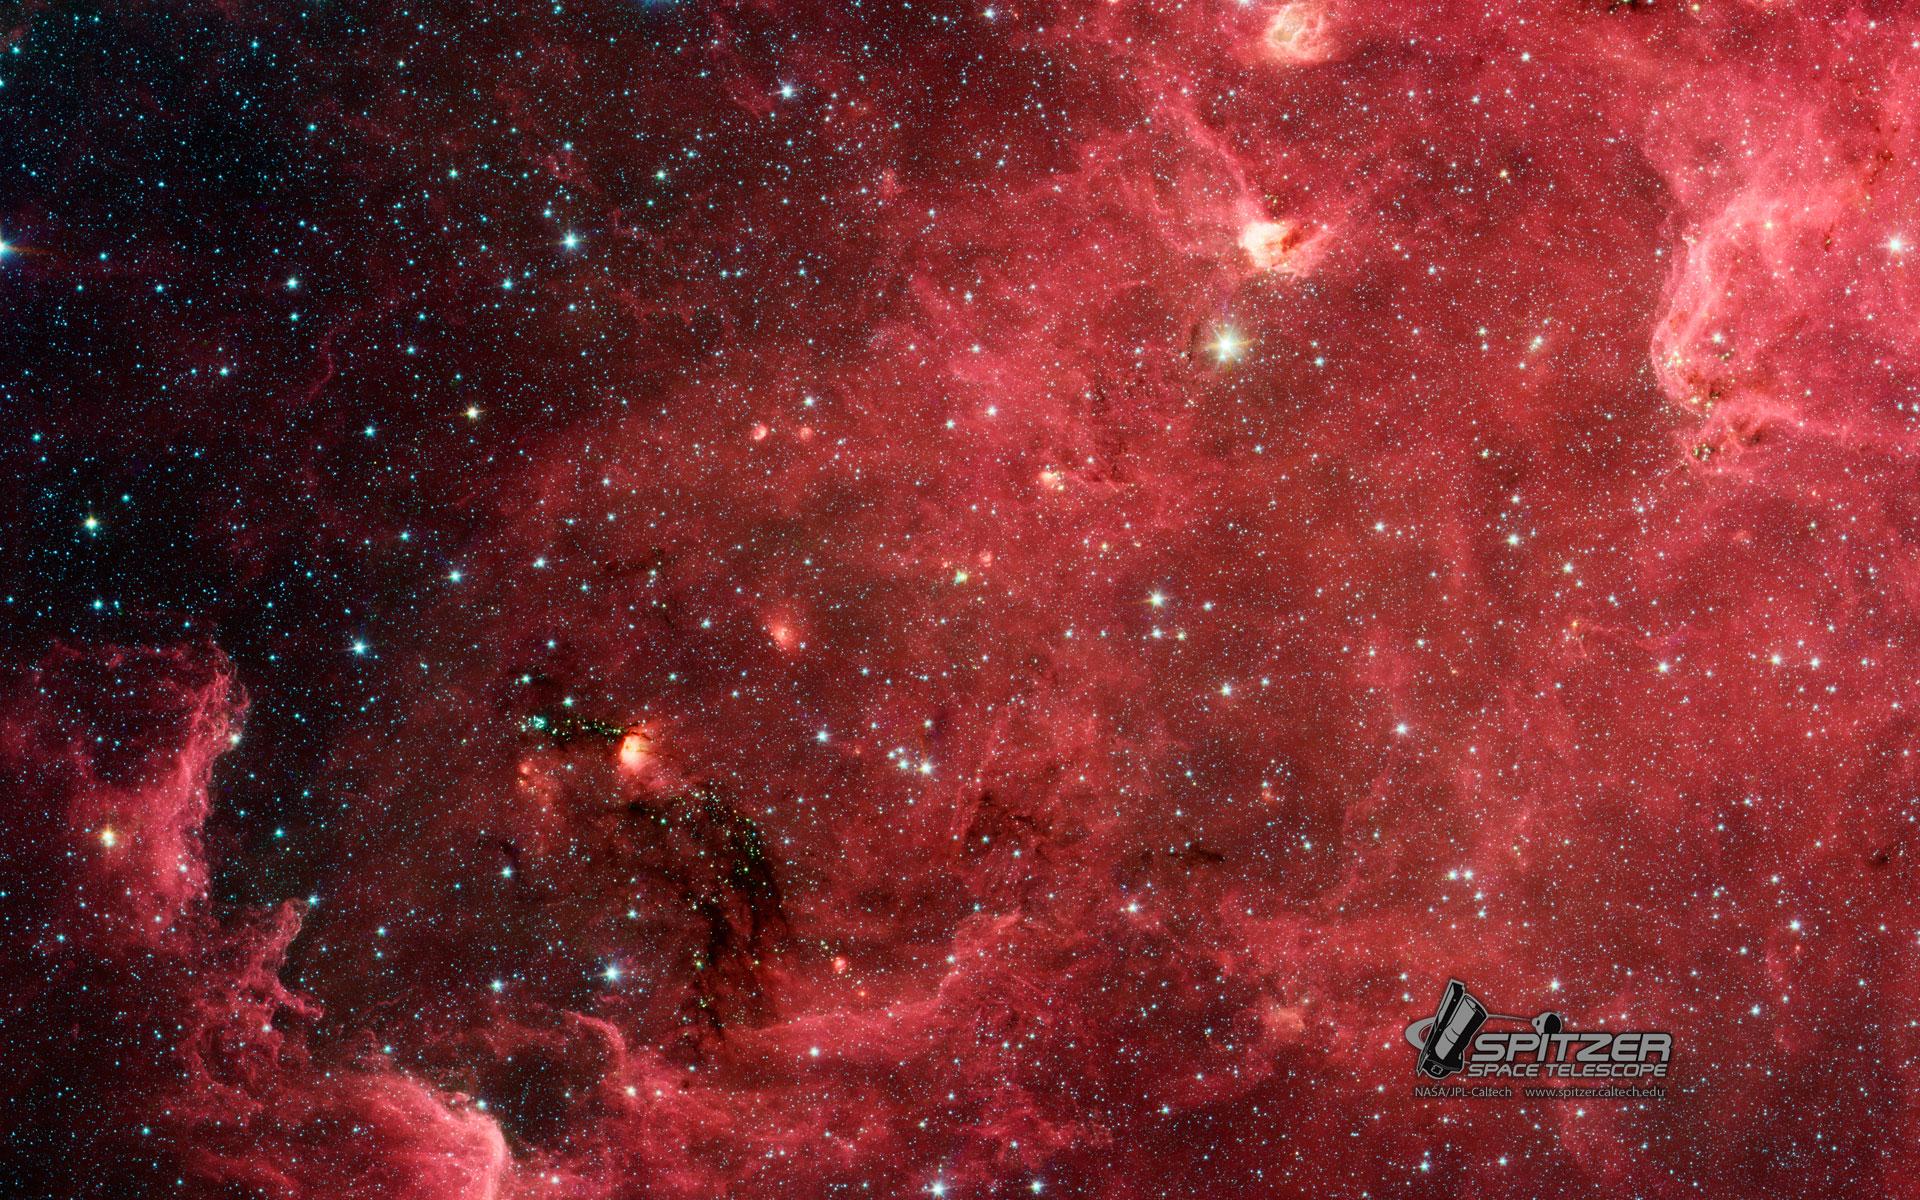 Download 1920 X - North America Nebula , HD Wallpaper & Backgrounds